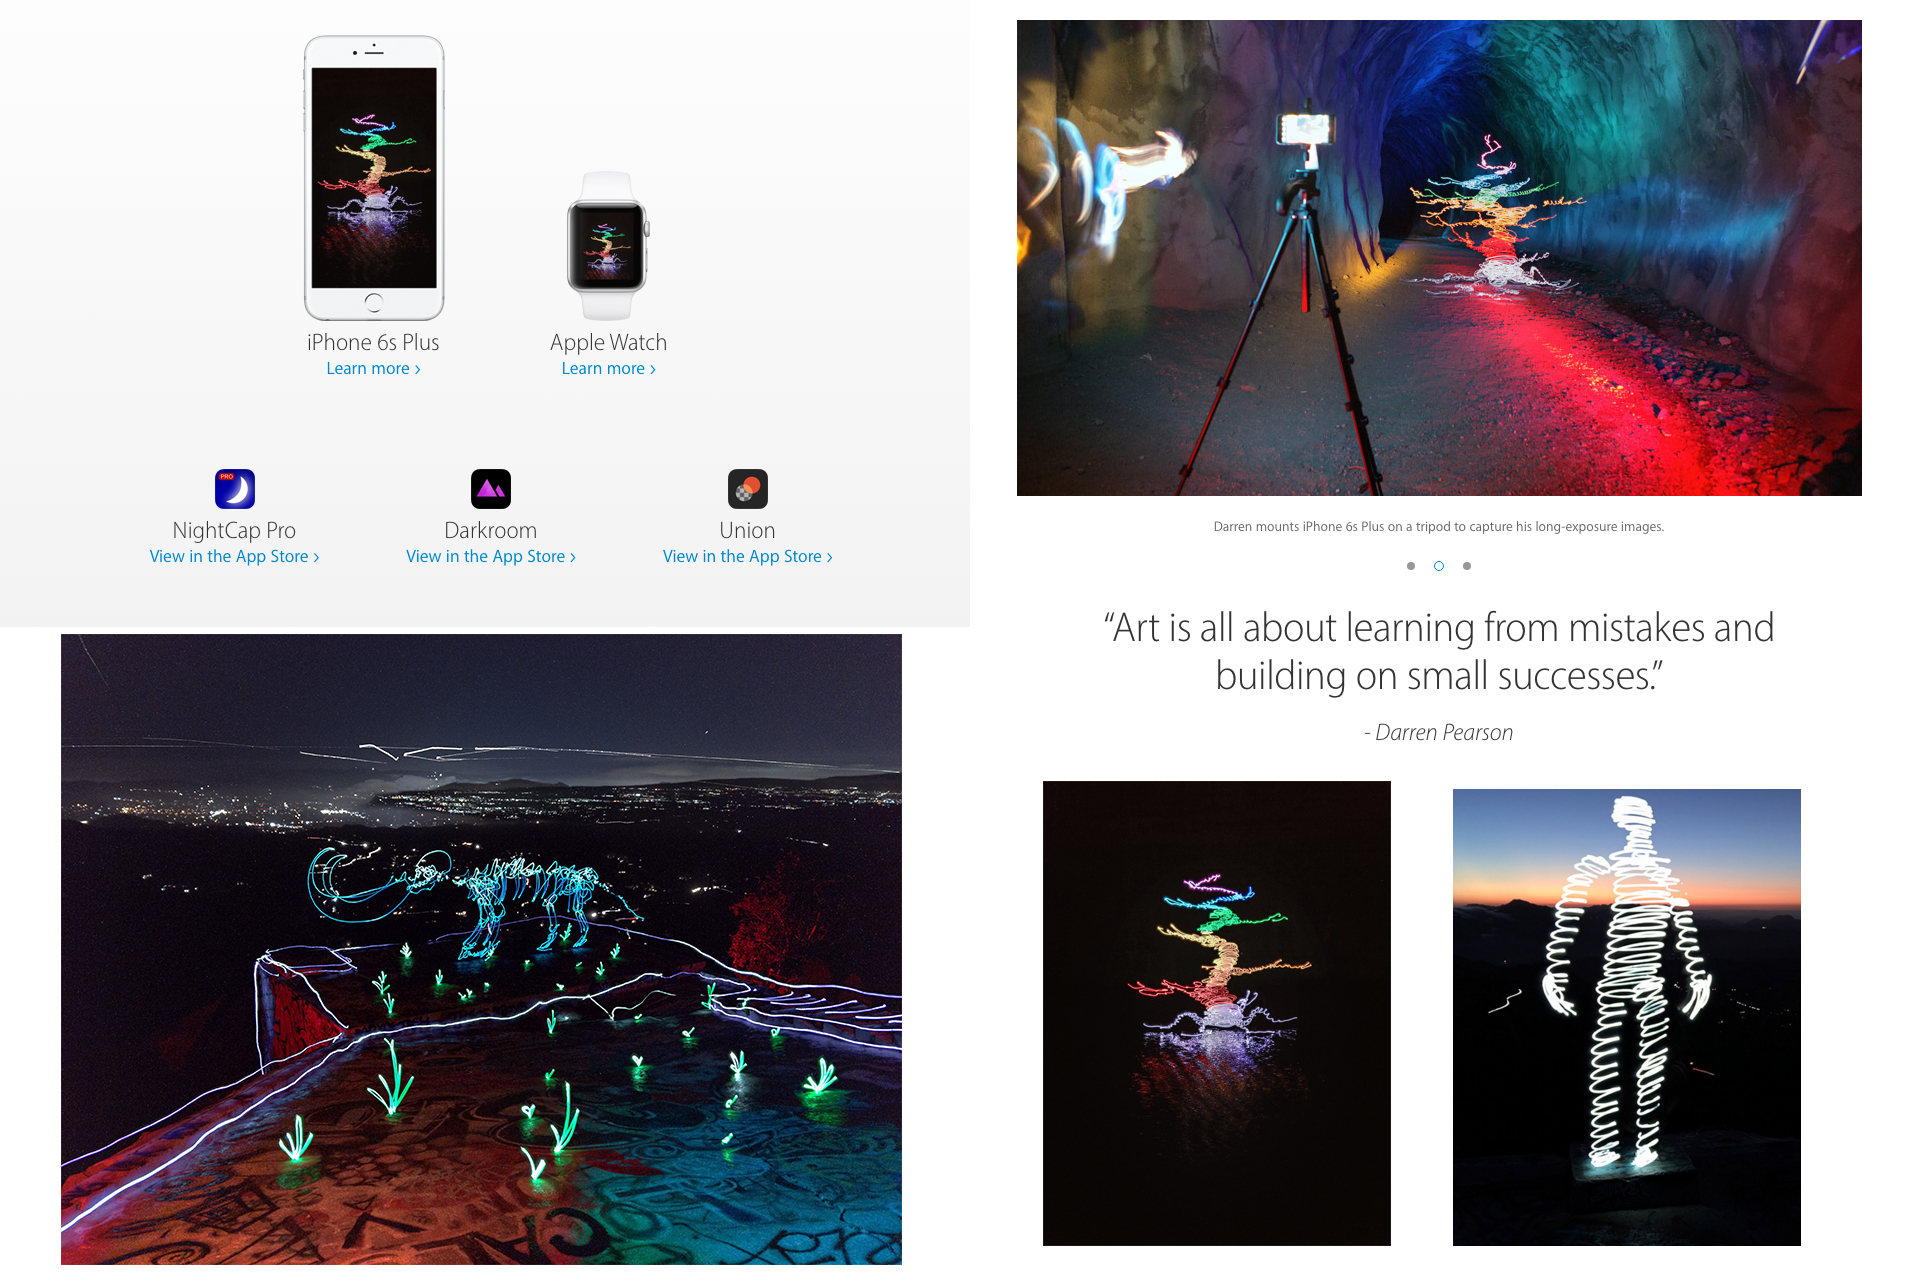 Light-Painting-Apple-Collage_Darren-Pearson.jpg